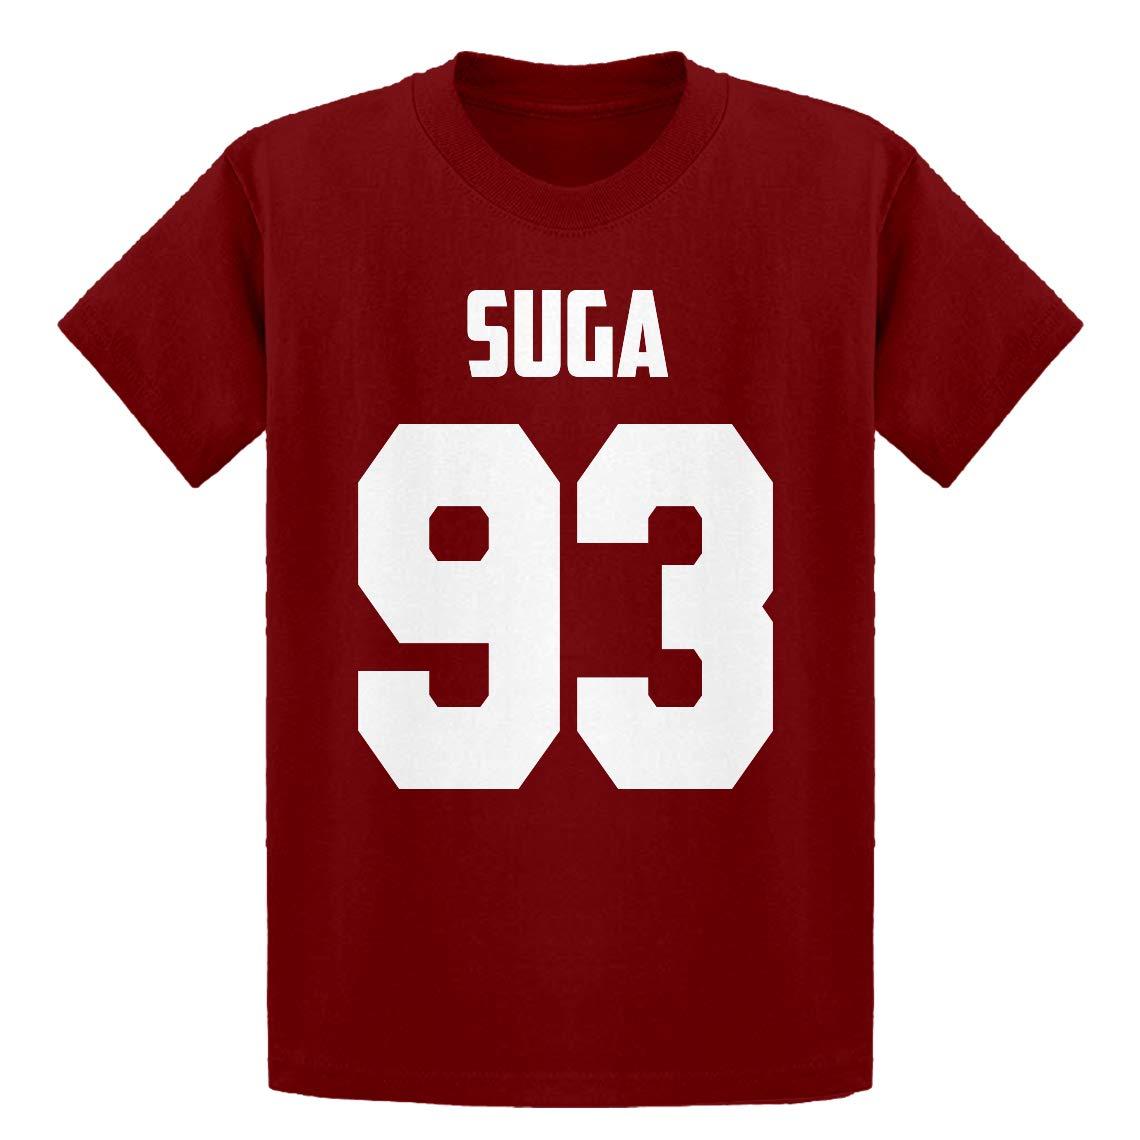 Indica Plateau Youth Suga 93 Kids T-Shirt